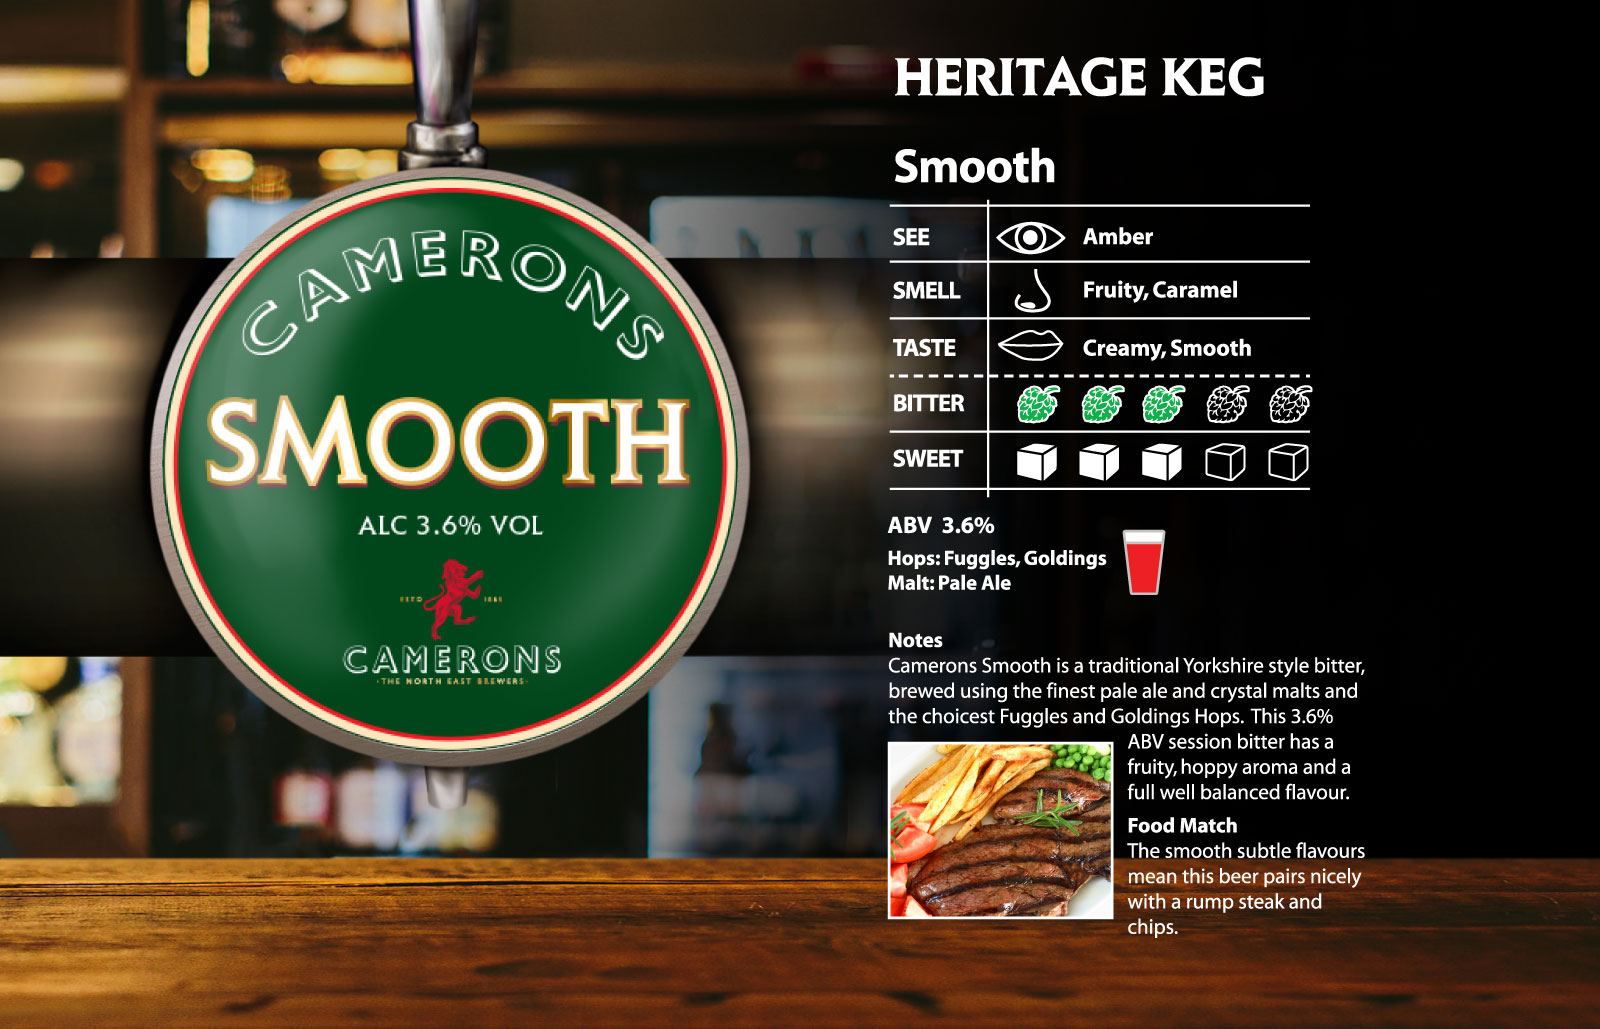 Camerons Smooth Heritage Keg